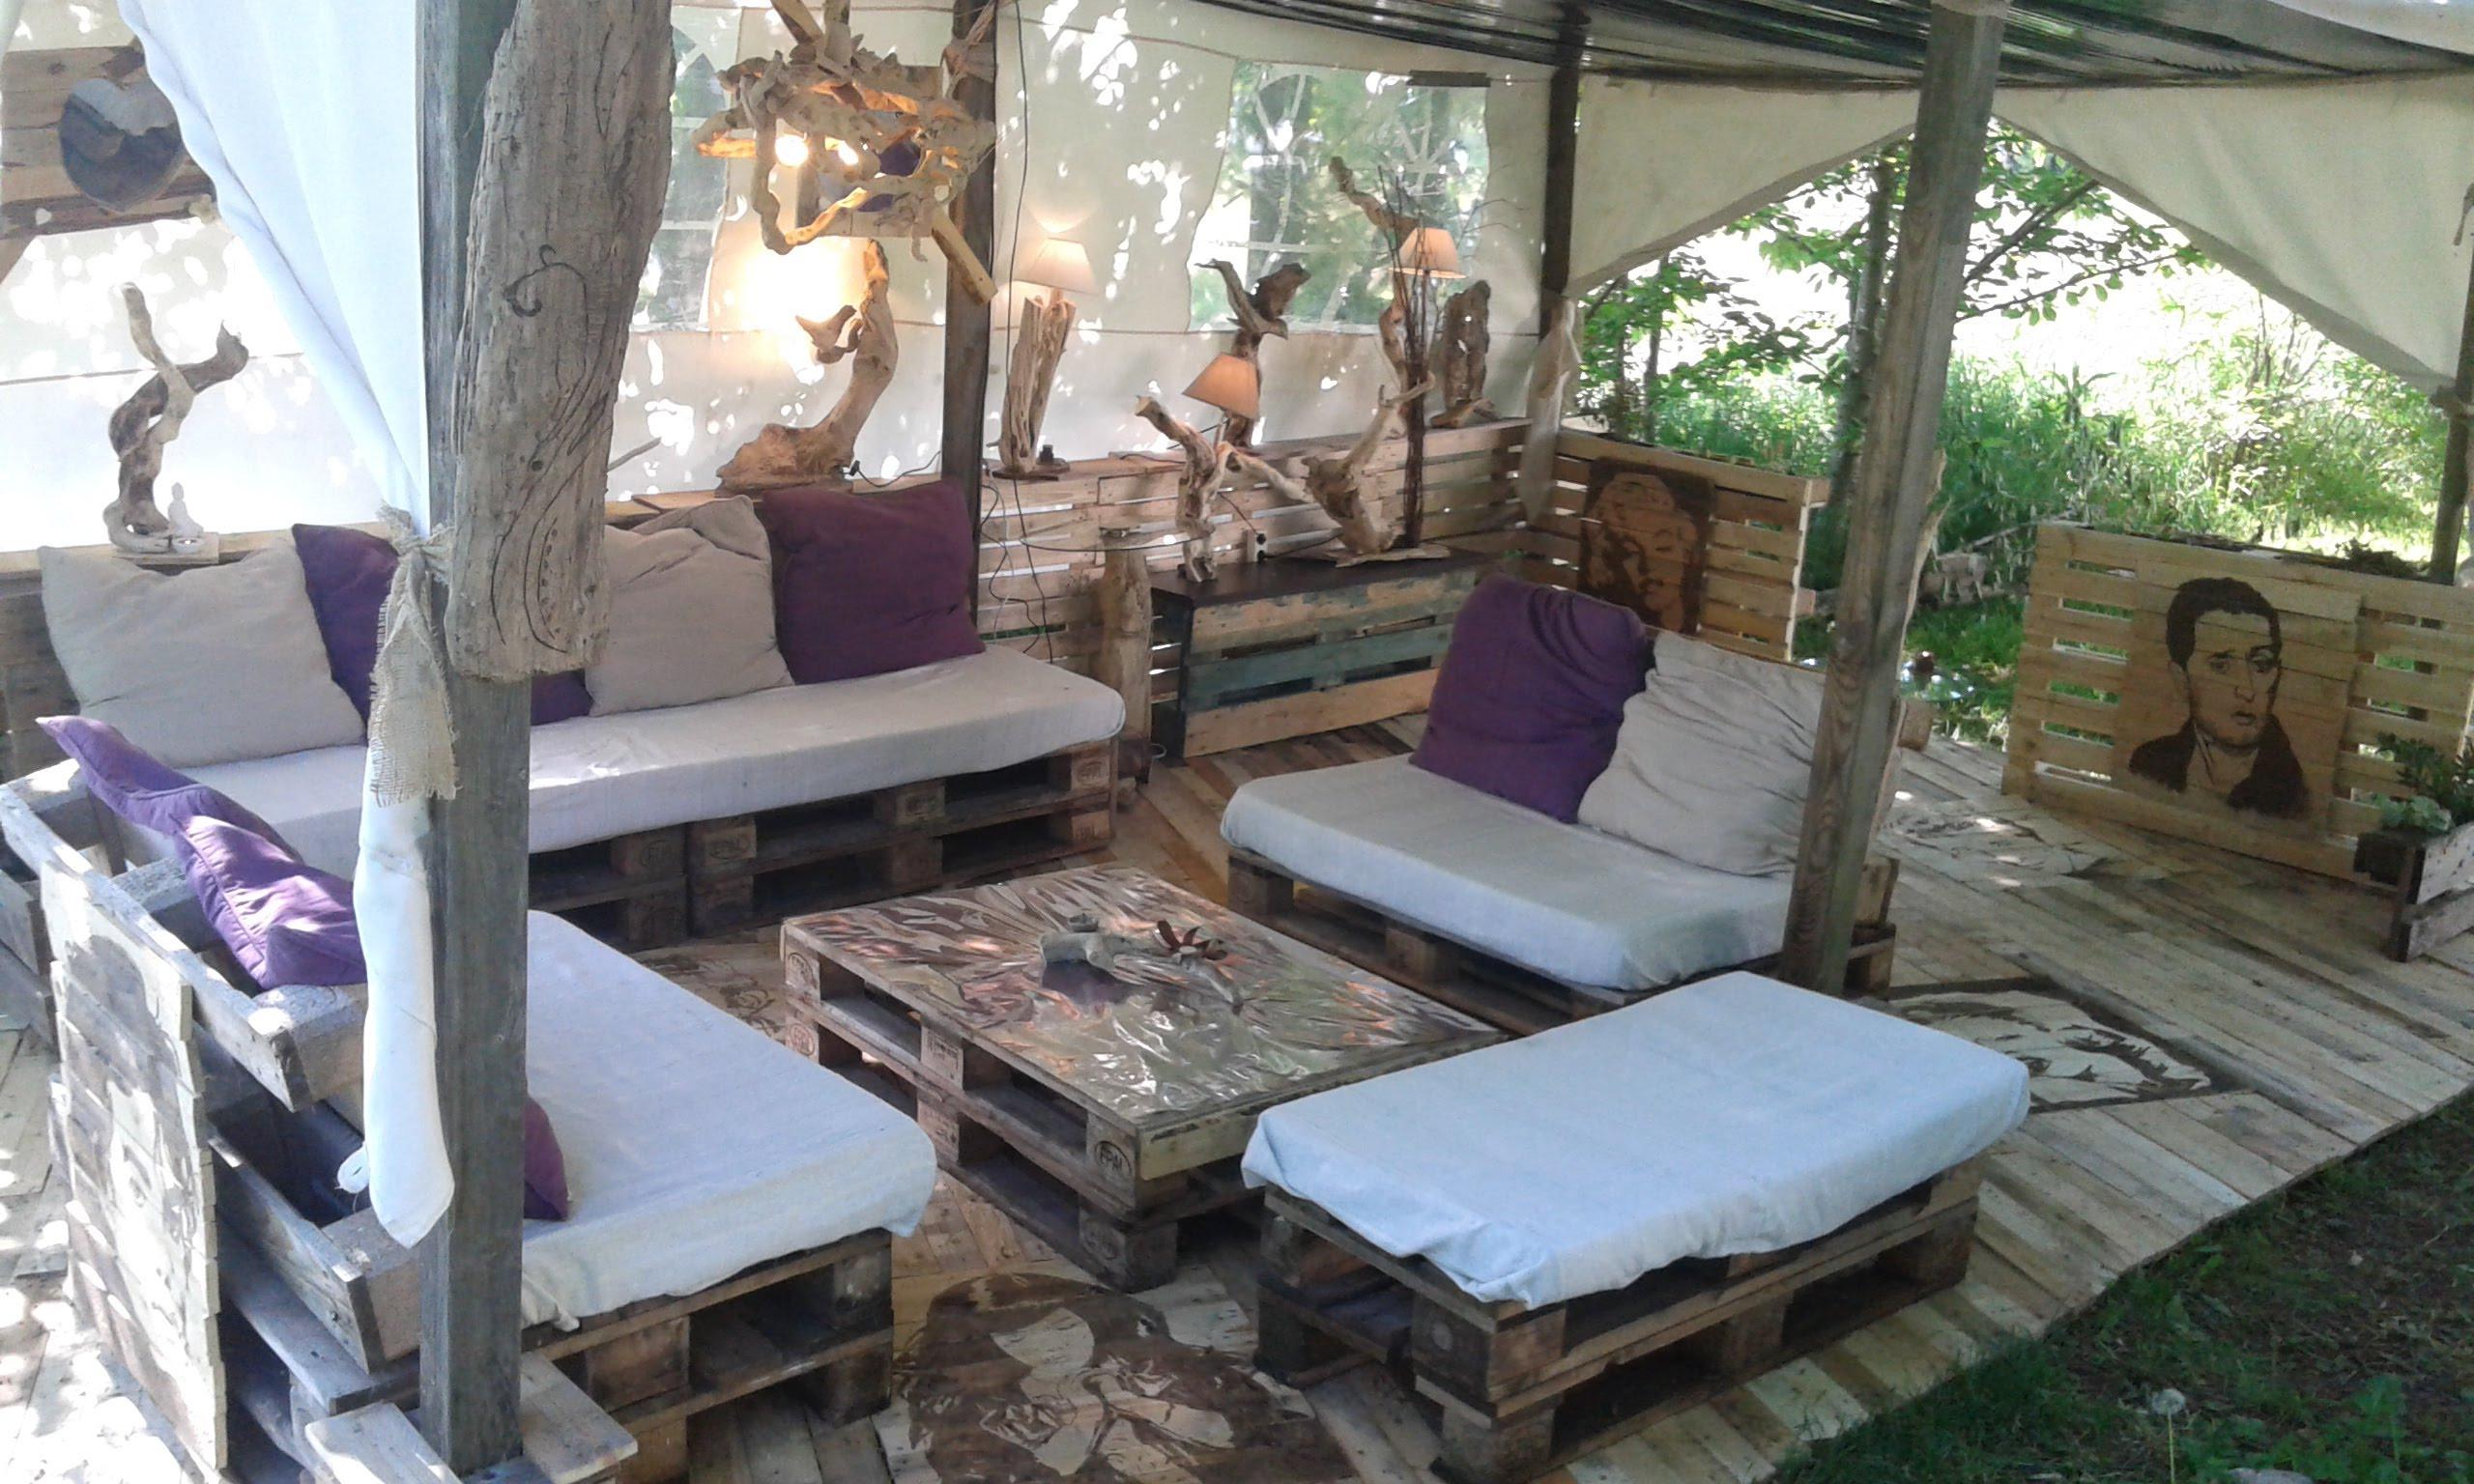 Table De Jardin Intermarche Luxe Photos Intermarché Salon De Jardin Pour Magnifique Luxe De Salon De Jardin